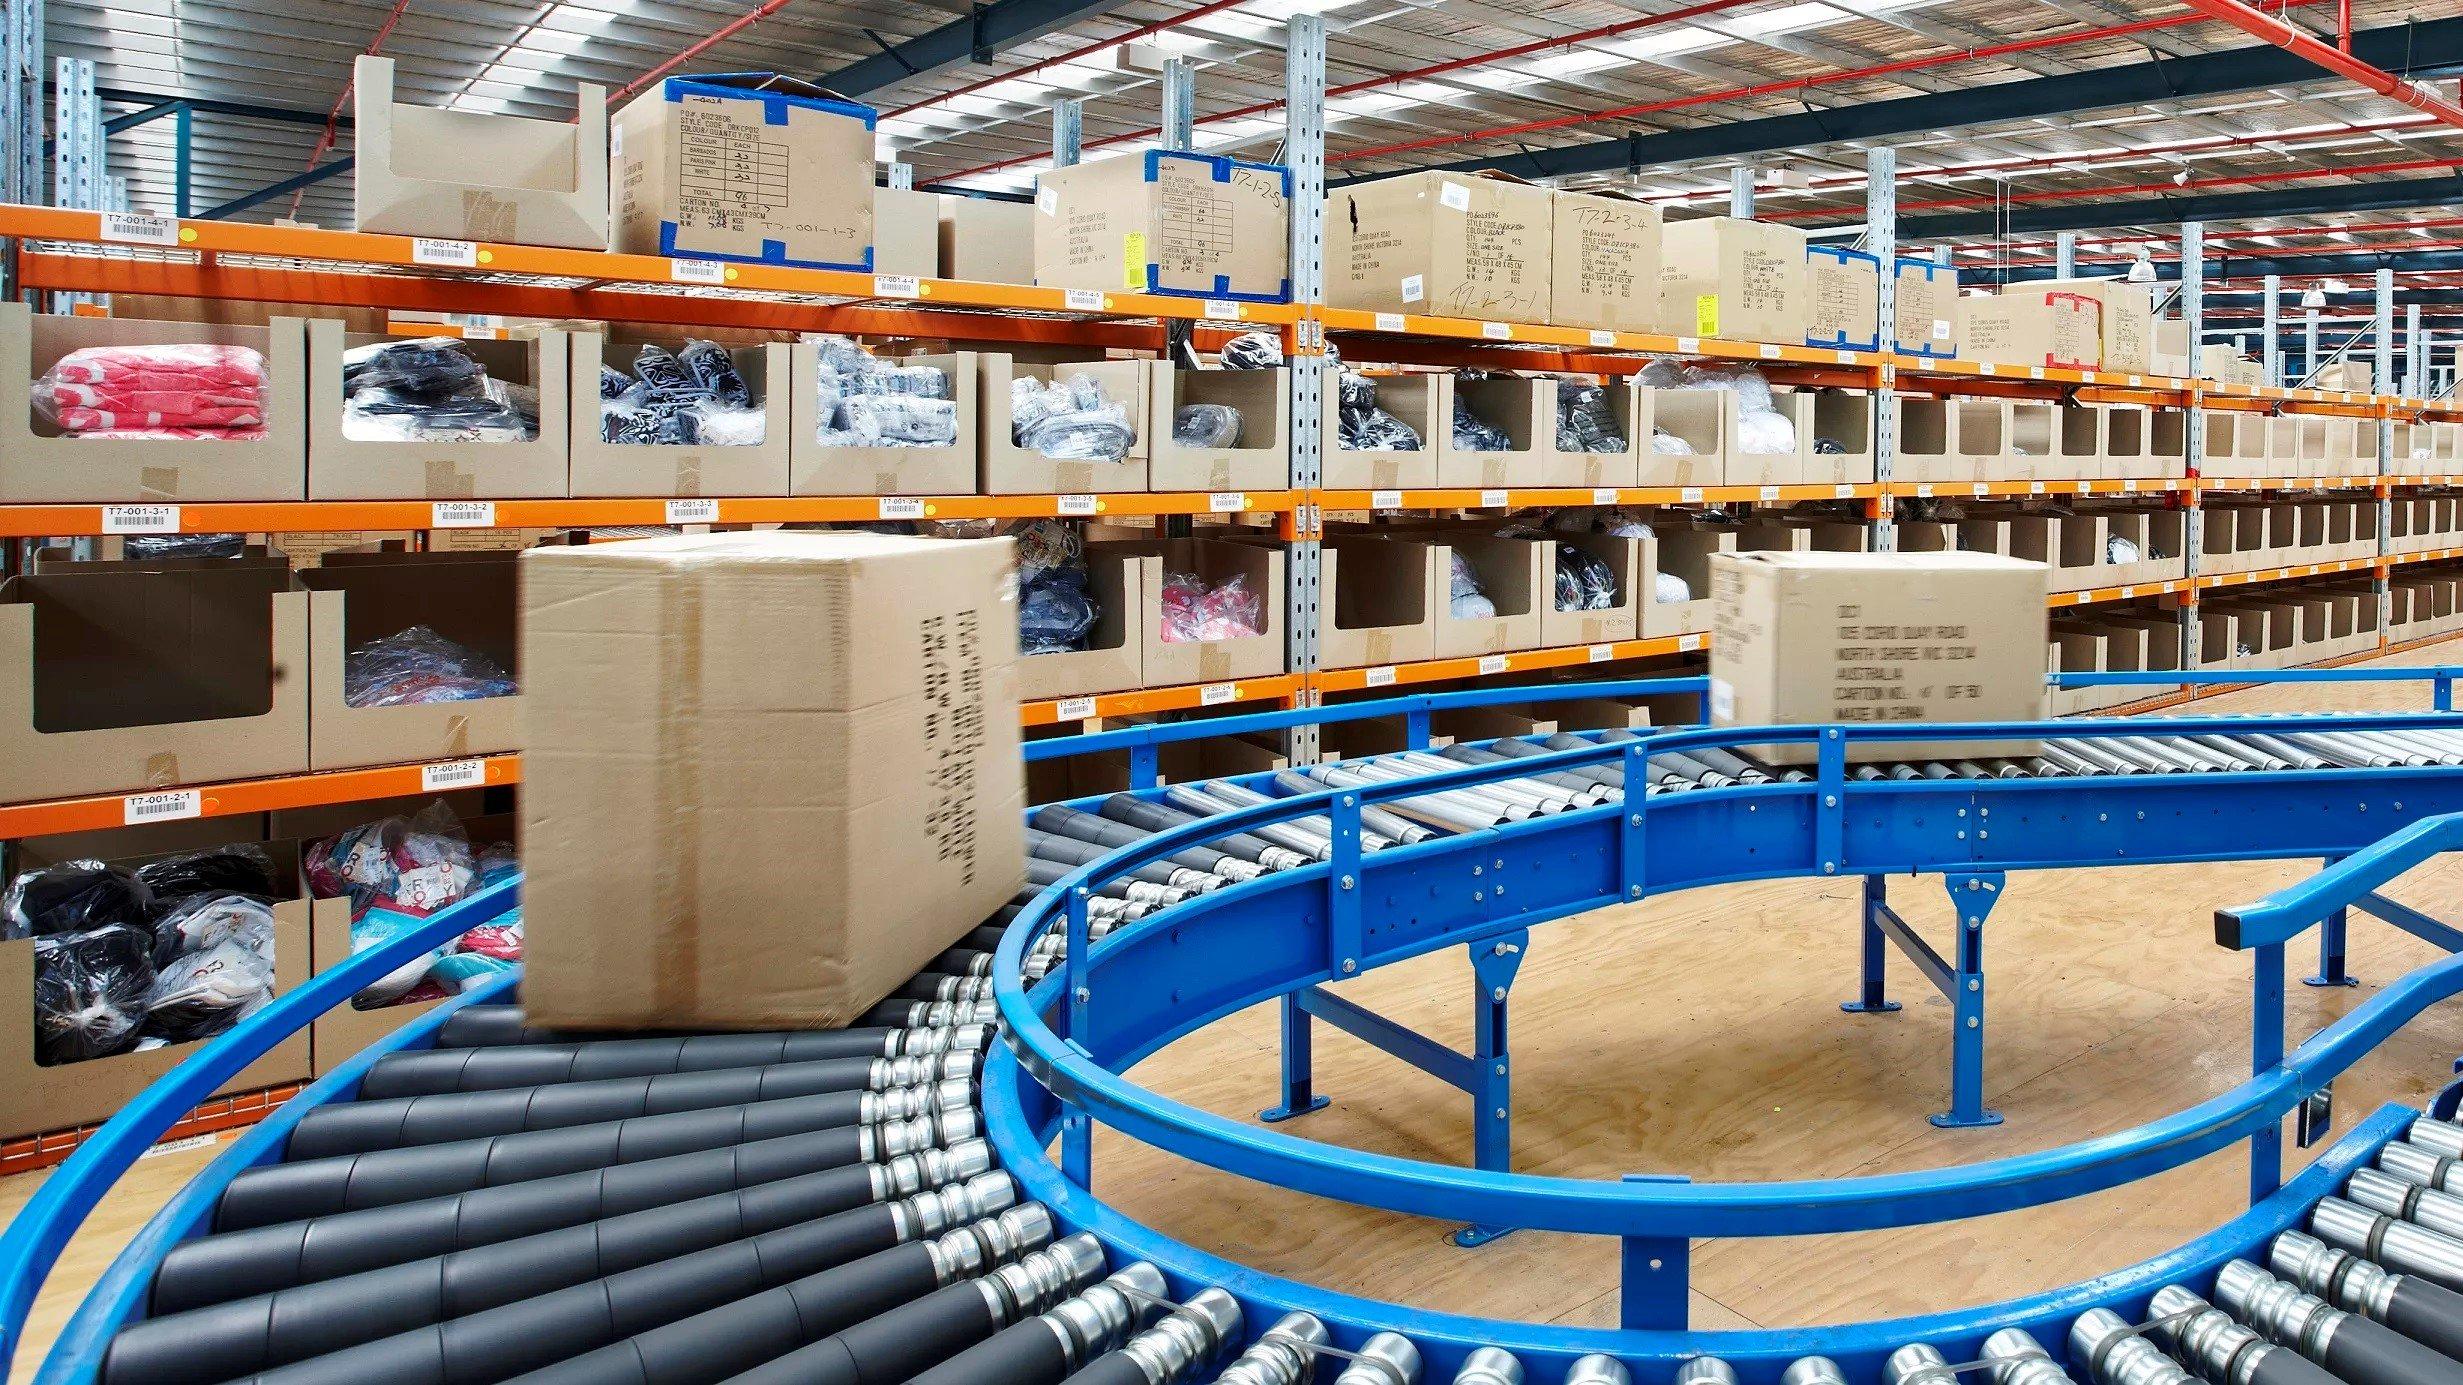 Warehouse Conveyor Systems - Long-Term Goals